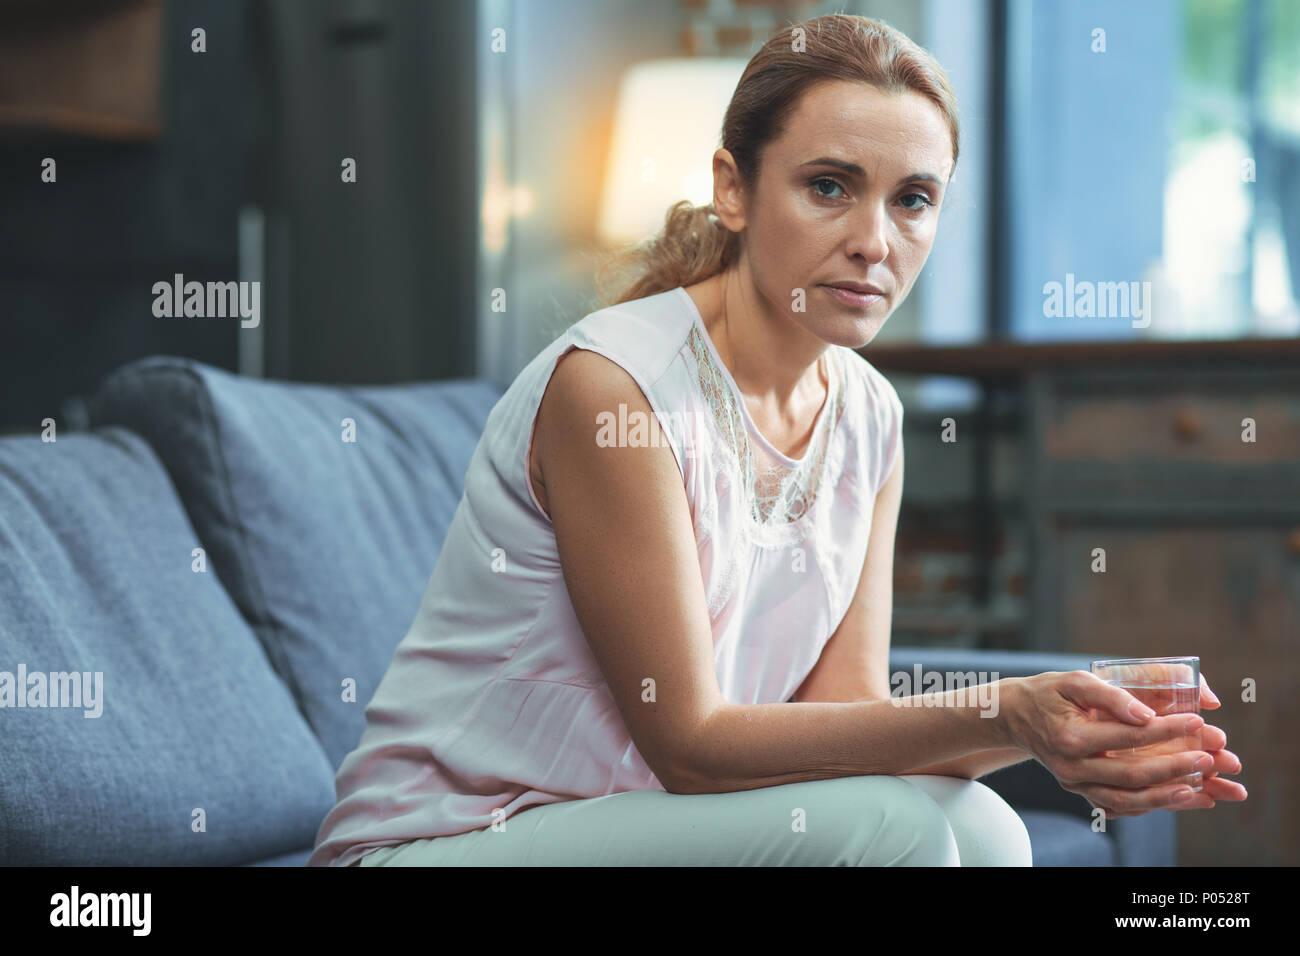 Focused mature woman showing depression symptoms - Stock Image